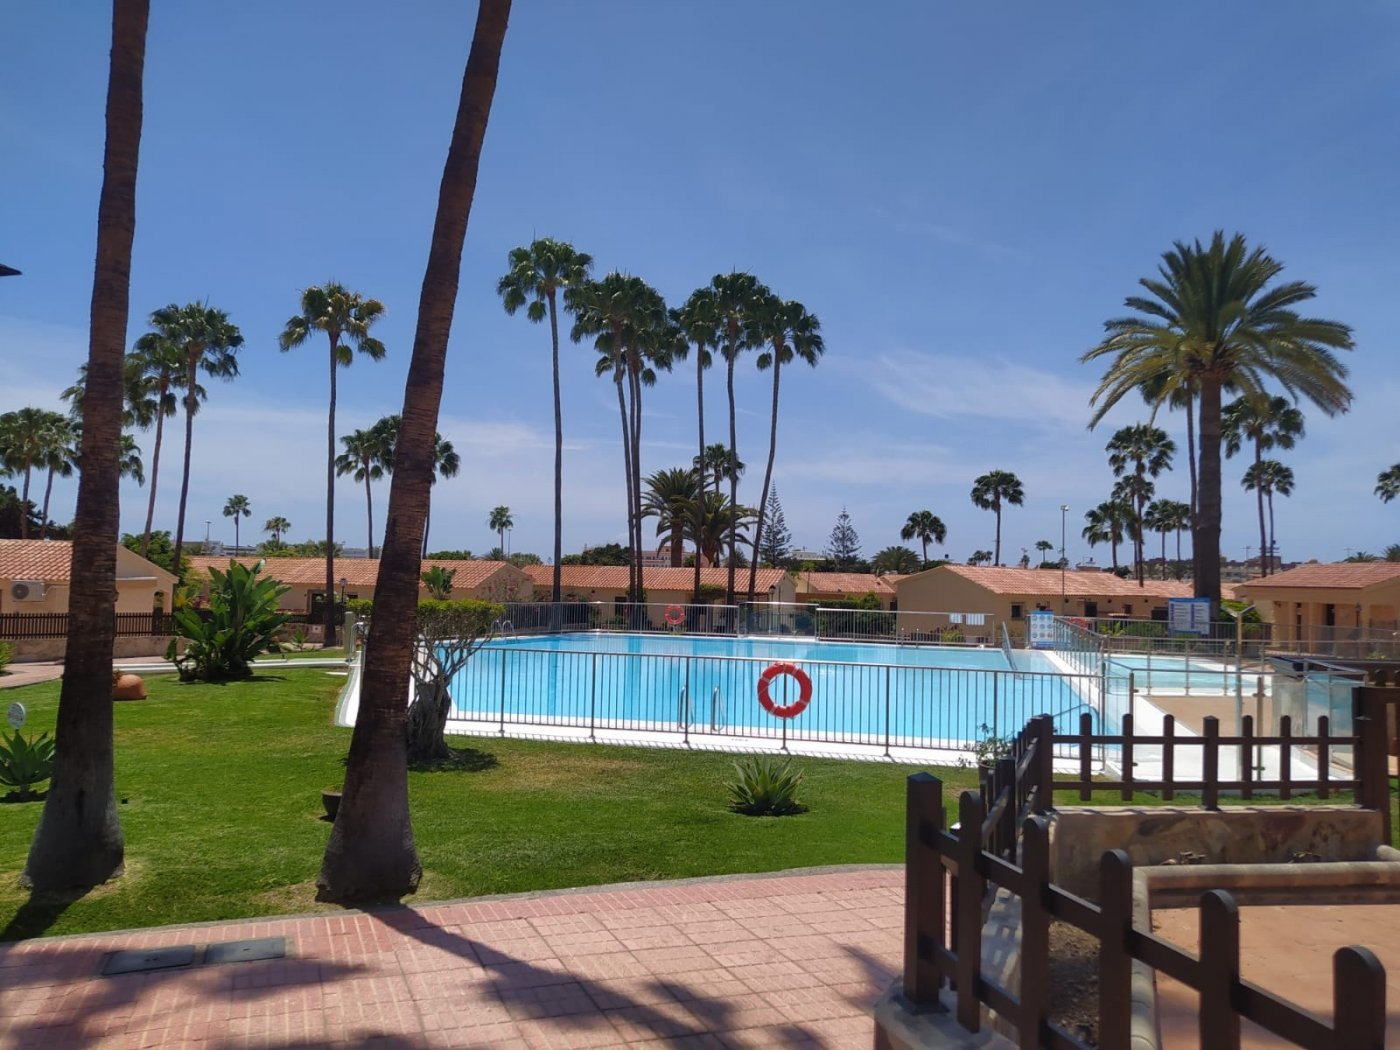 Bungalow for rent in Playa del Inglés, San Bartolome de Tirajana